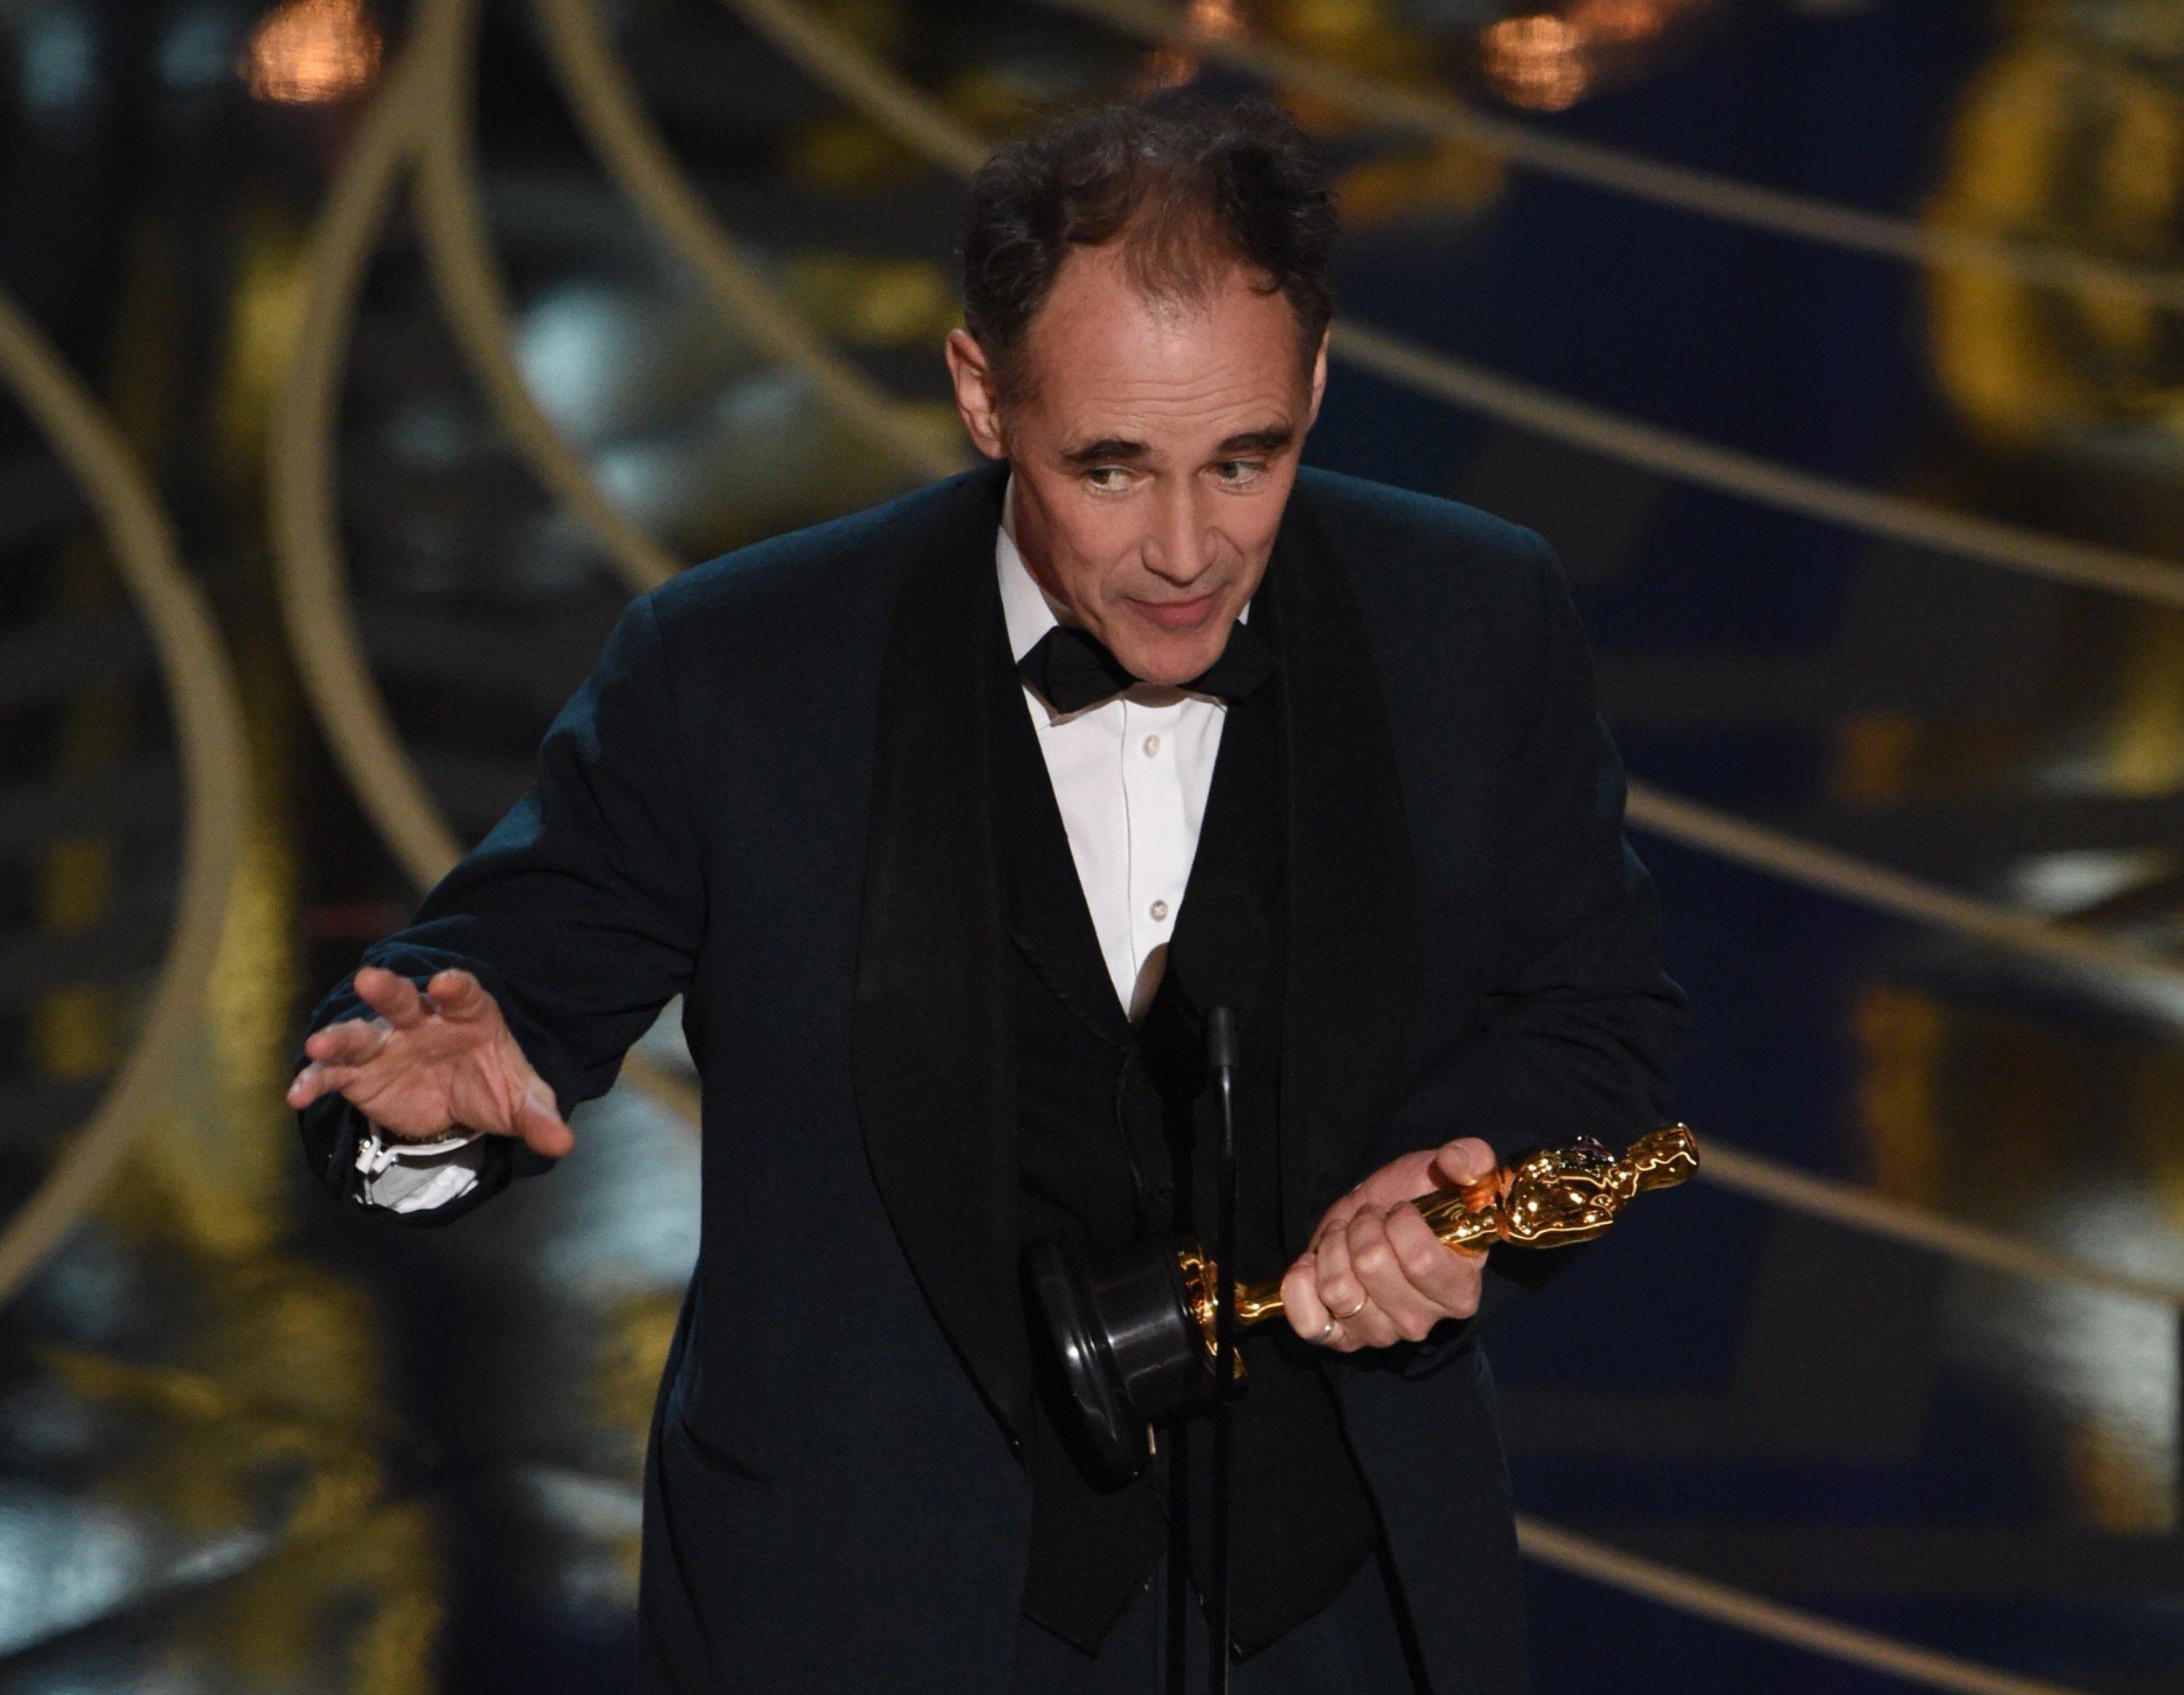 Oscars 2016: Mark Rylance gives a heartfelt acceptance speech as he wins best supporting actor